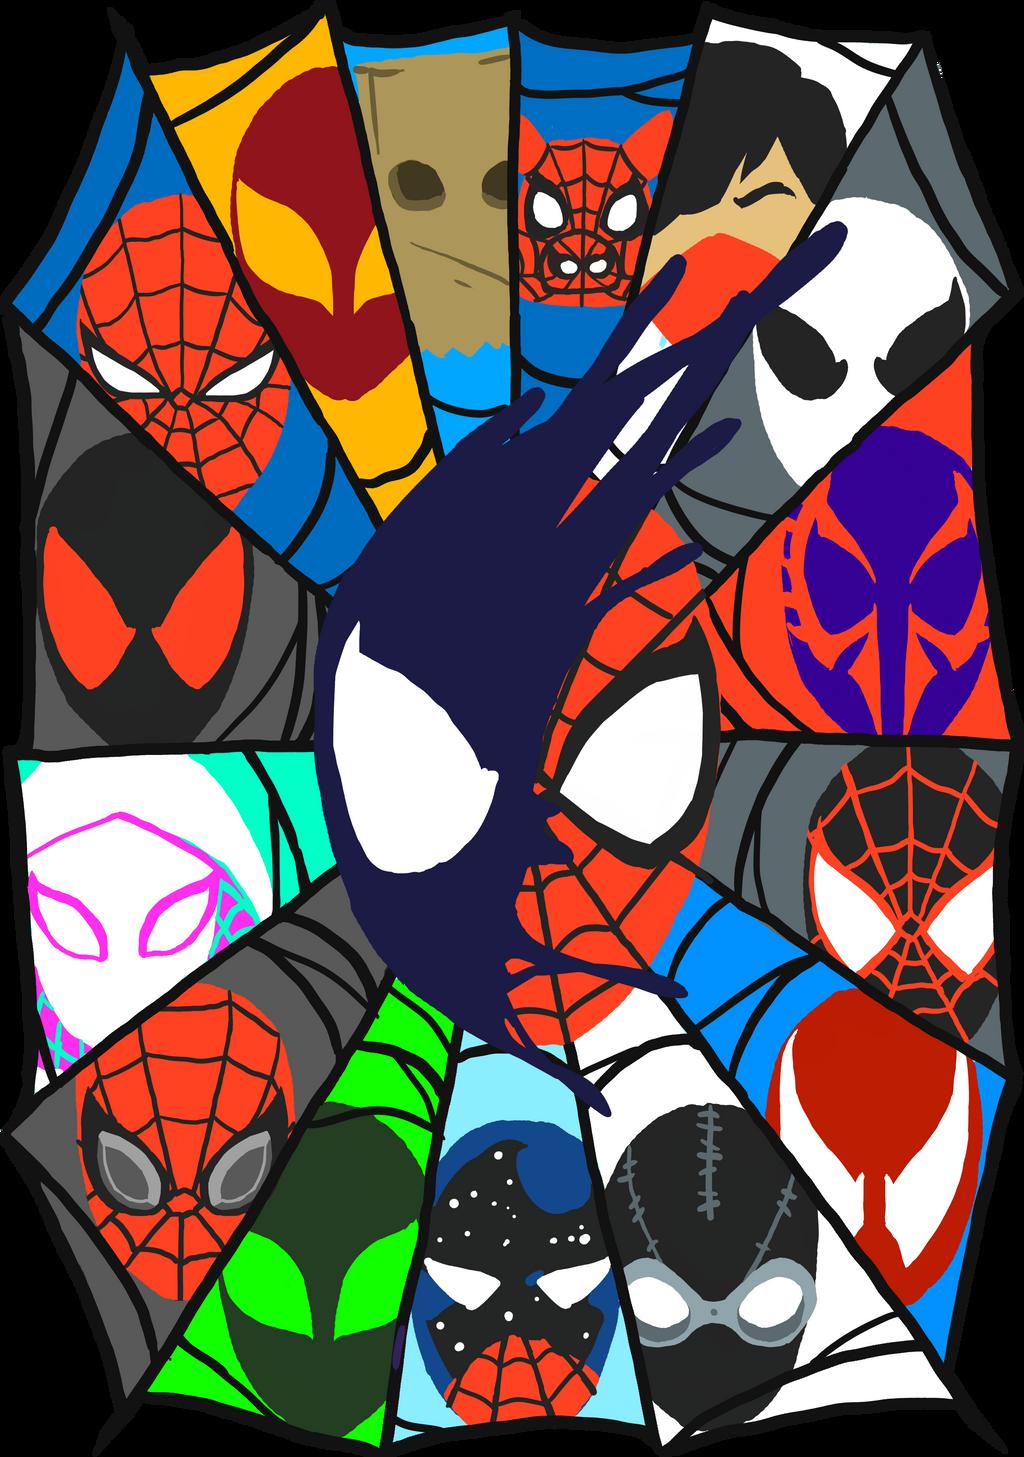 Design t shirt artwork -  Spider Man T Shirt Design Alternate By Mrrizeag